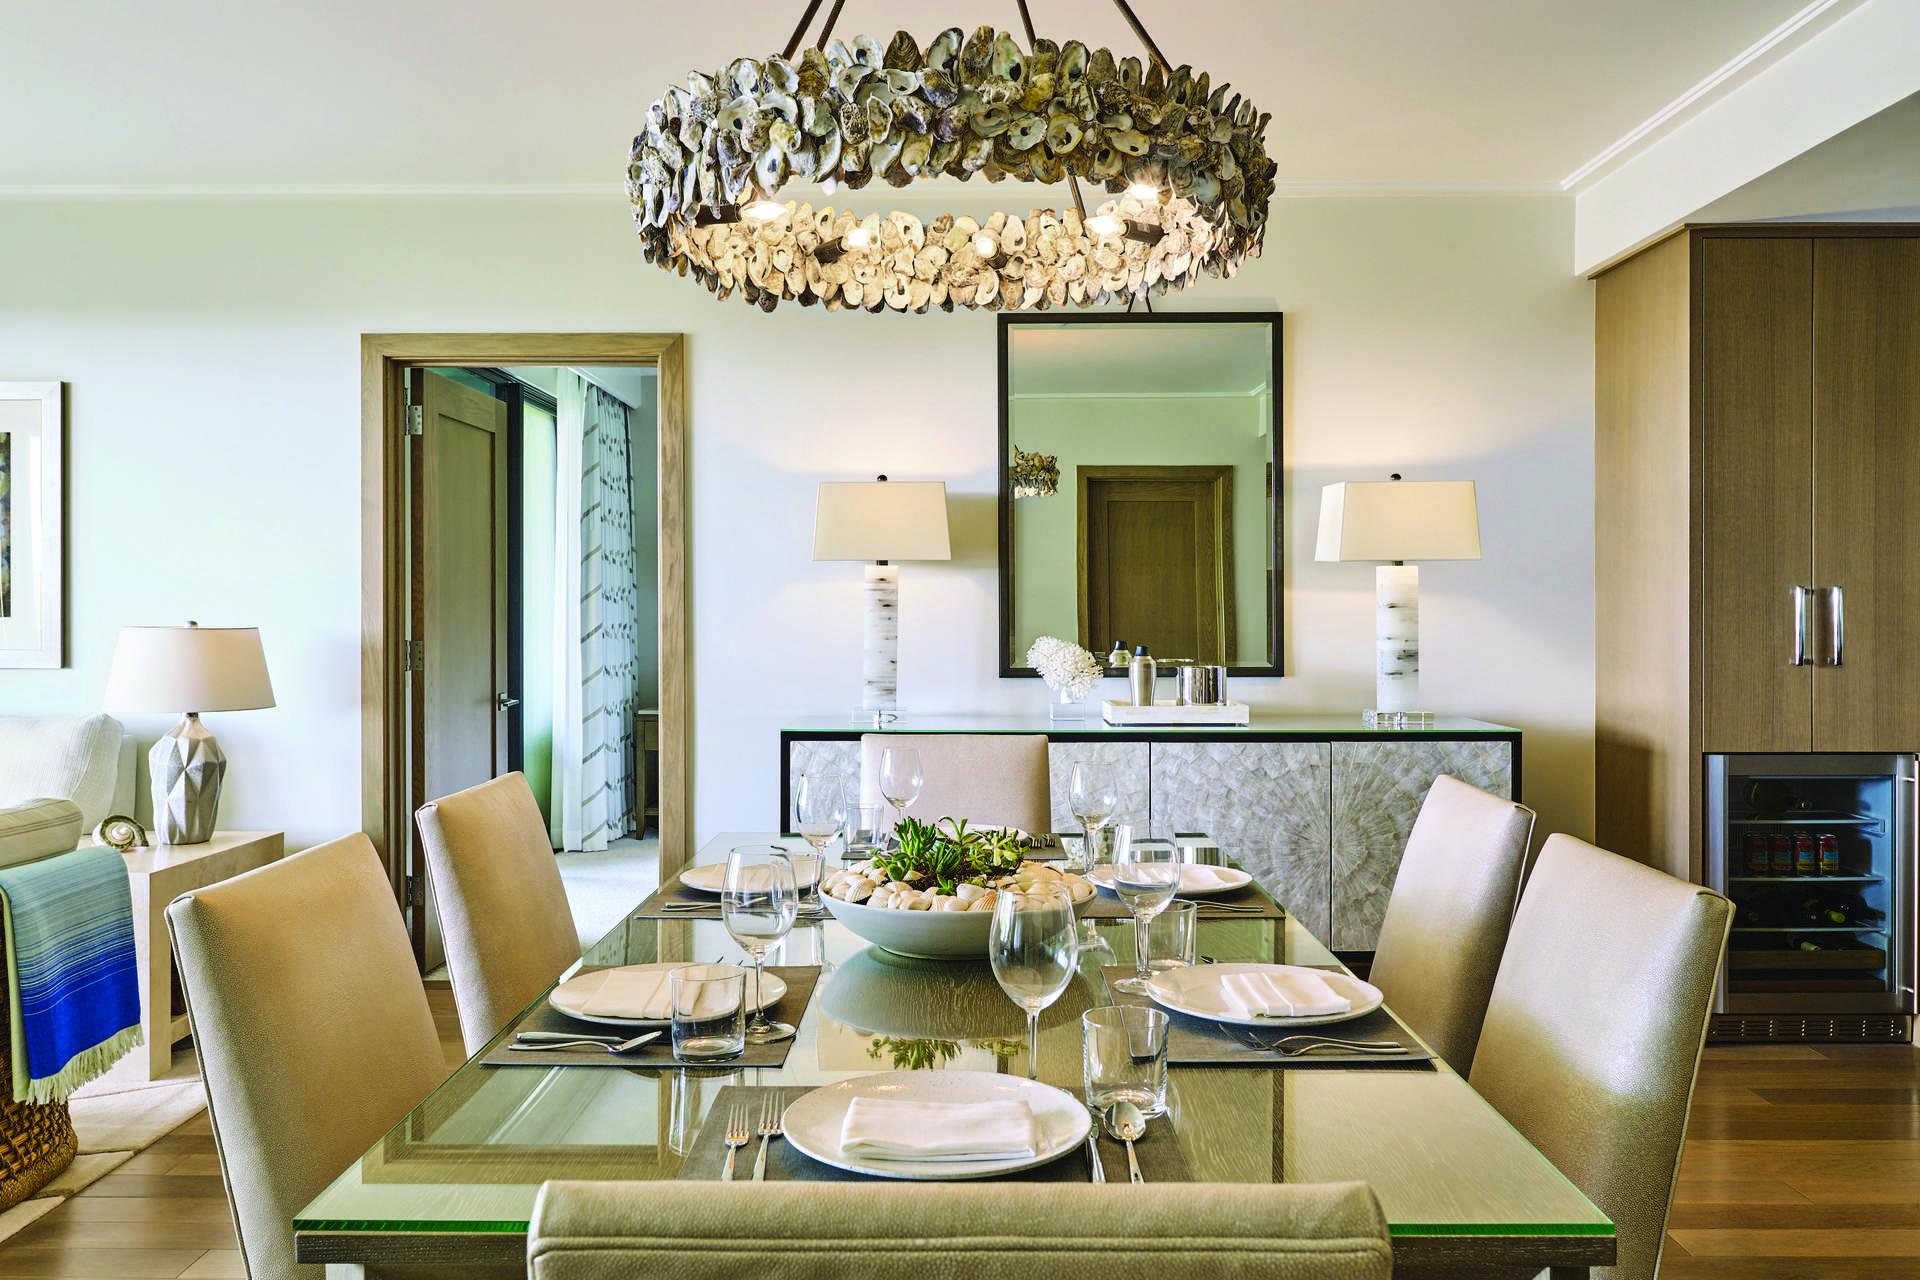 Luxury vacation rentals usa - Hawaii - Kauai - Hokuala kauai - Maliula Premier | 2 Bedrooms - Image 1/10